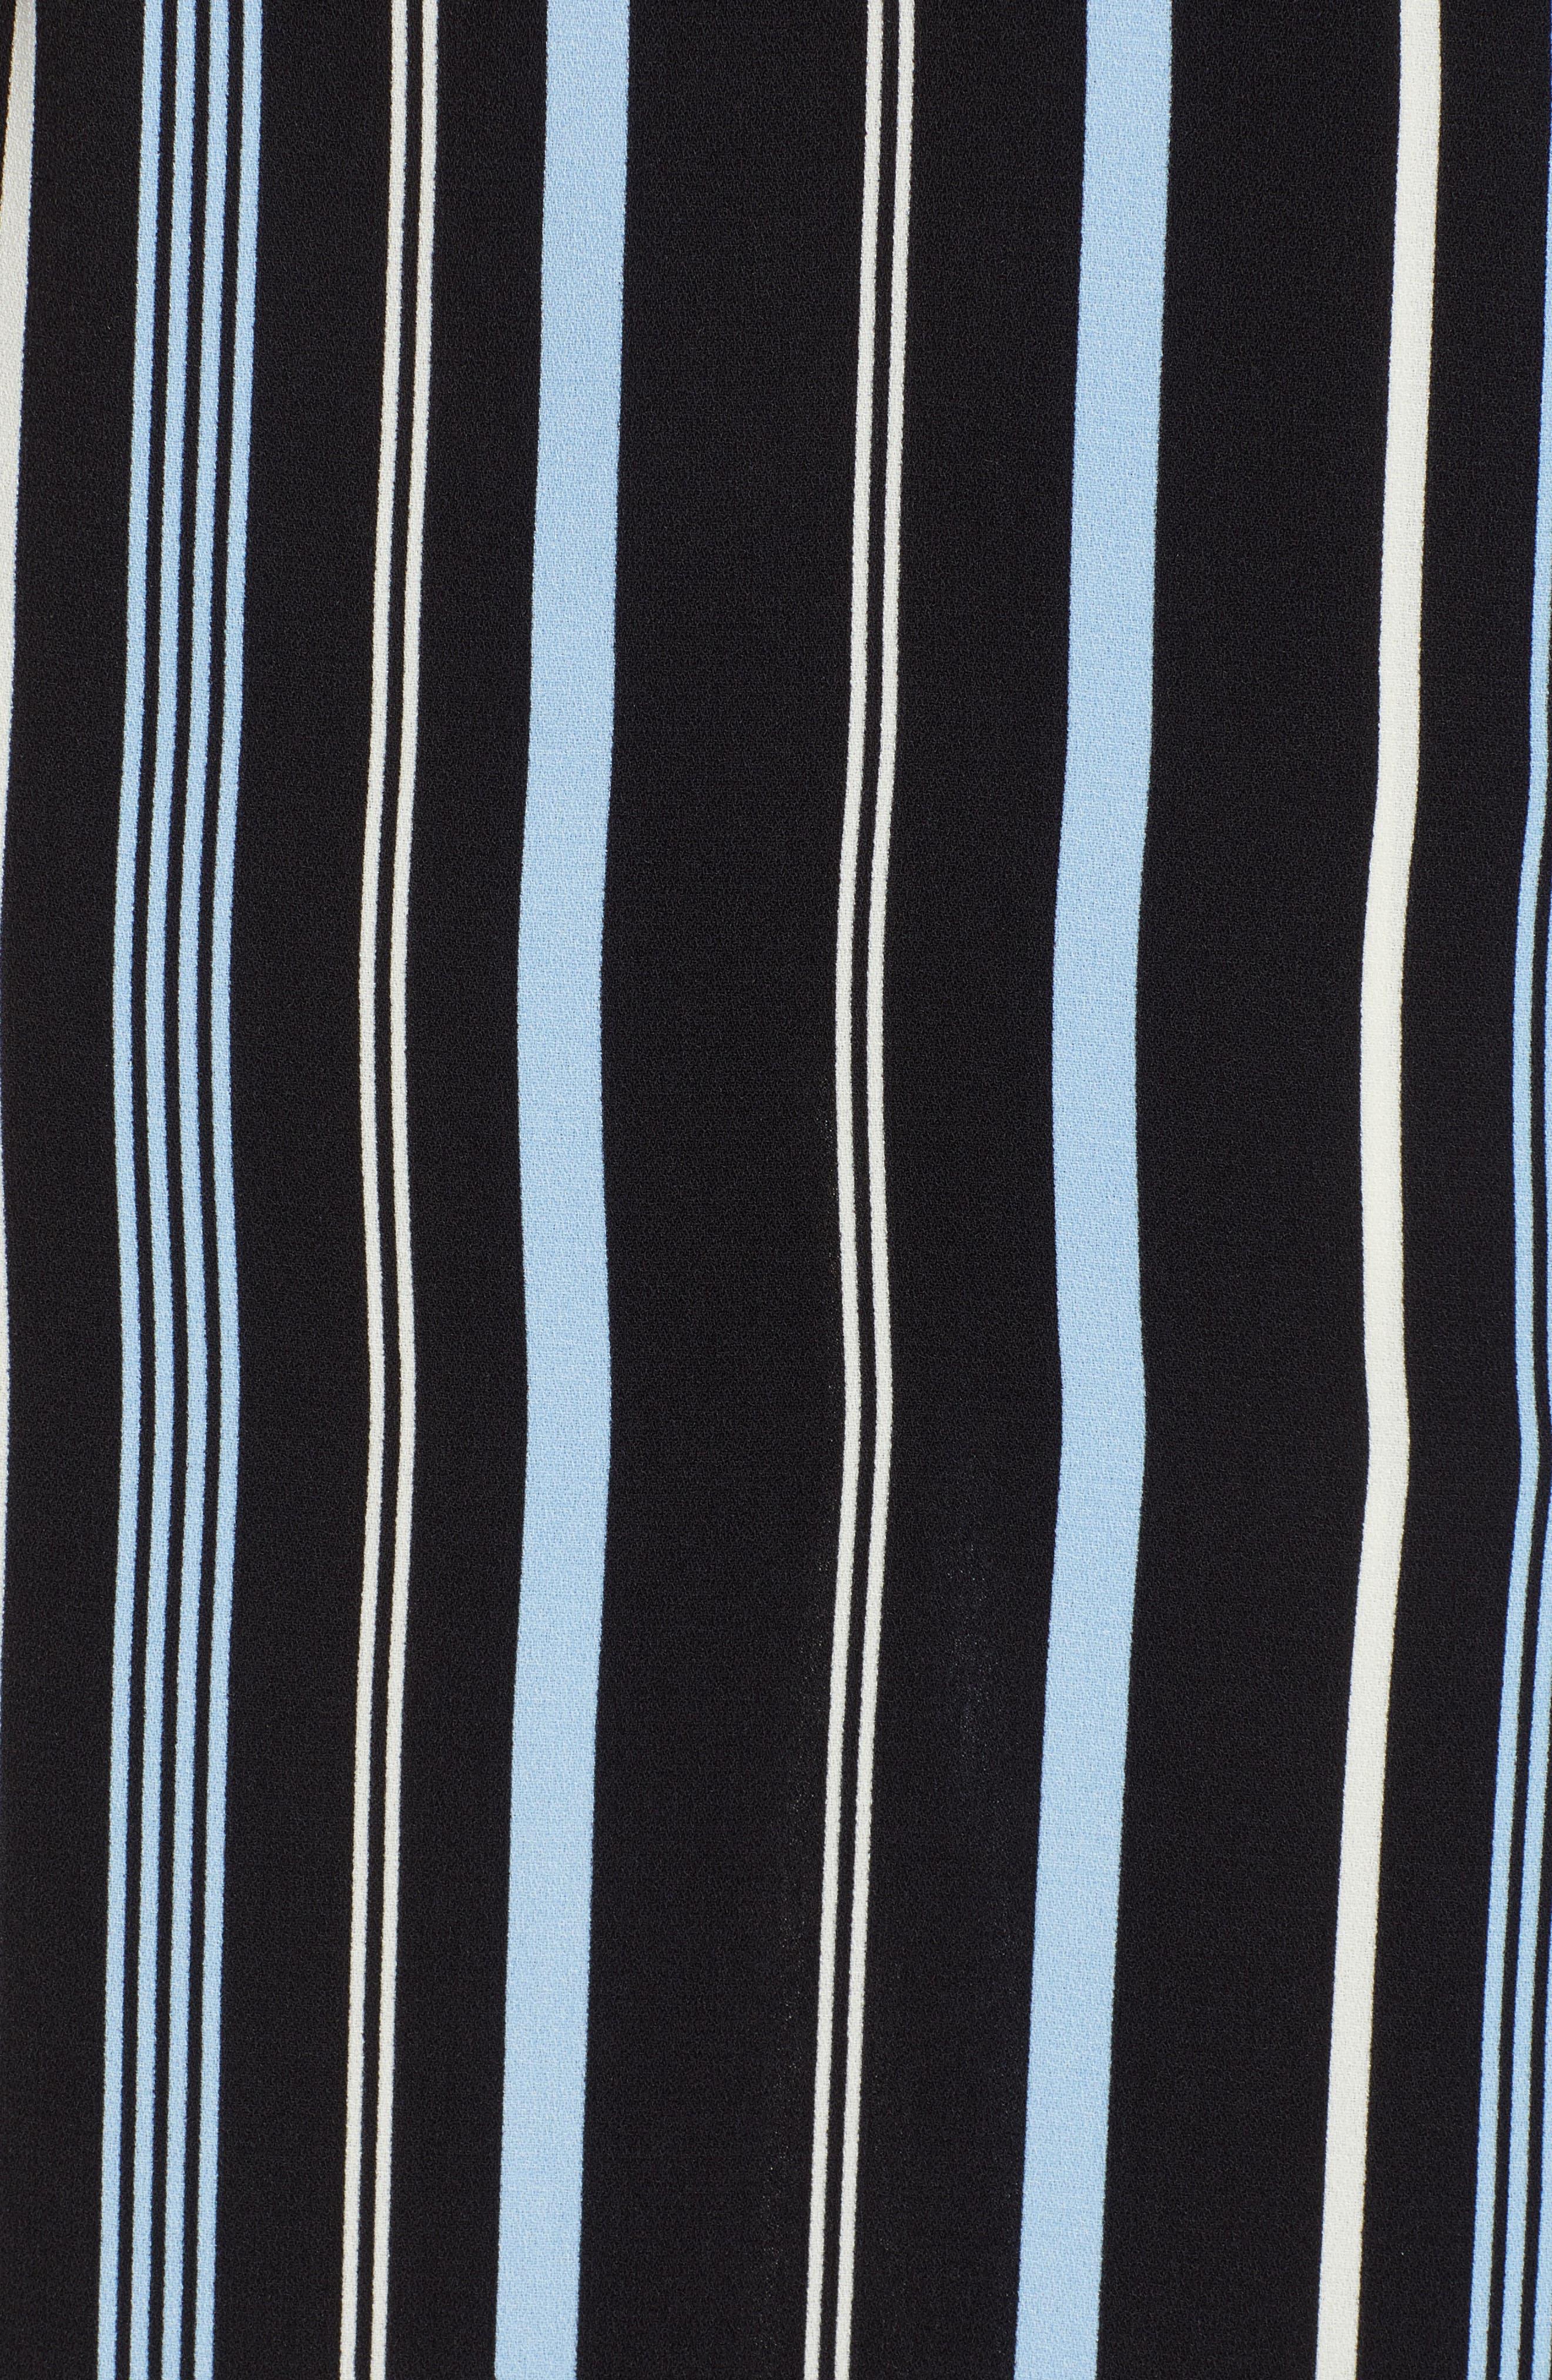 Button Wrap Skirt,                             Alternate thumbnail 6, color,                             BLACK MULTI COLORED STRIPE